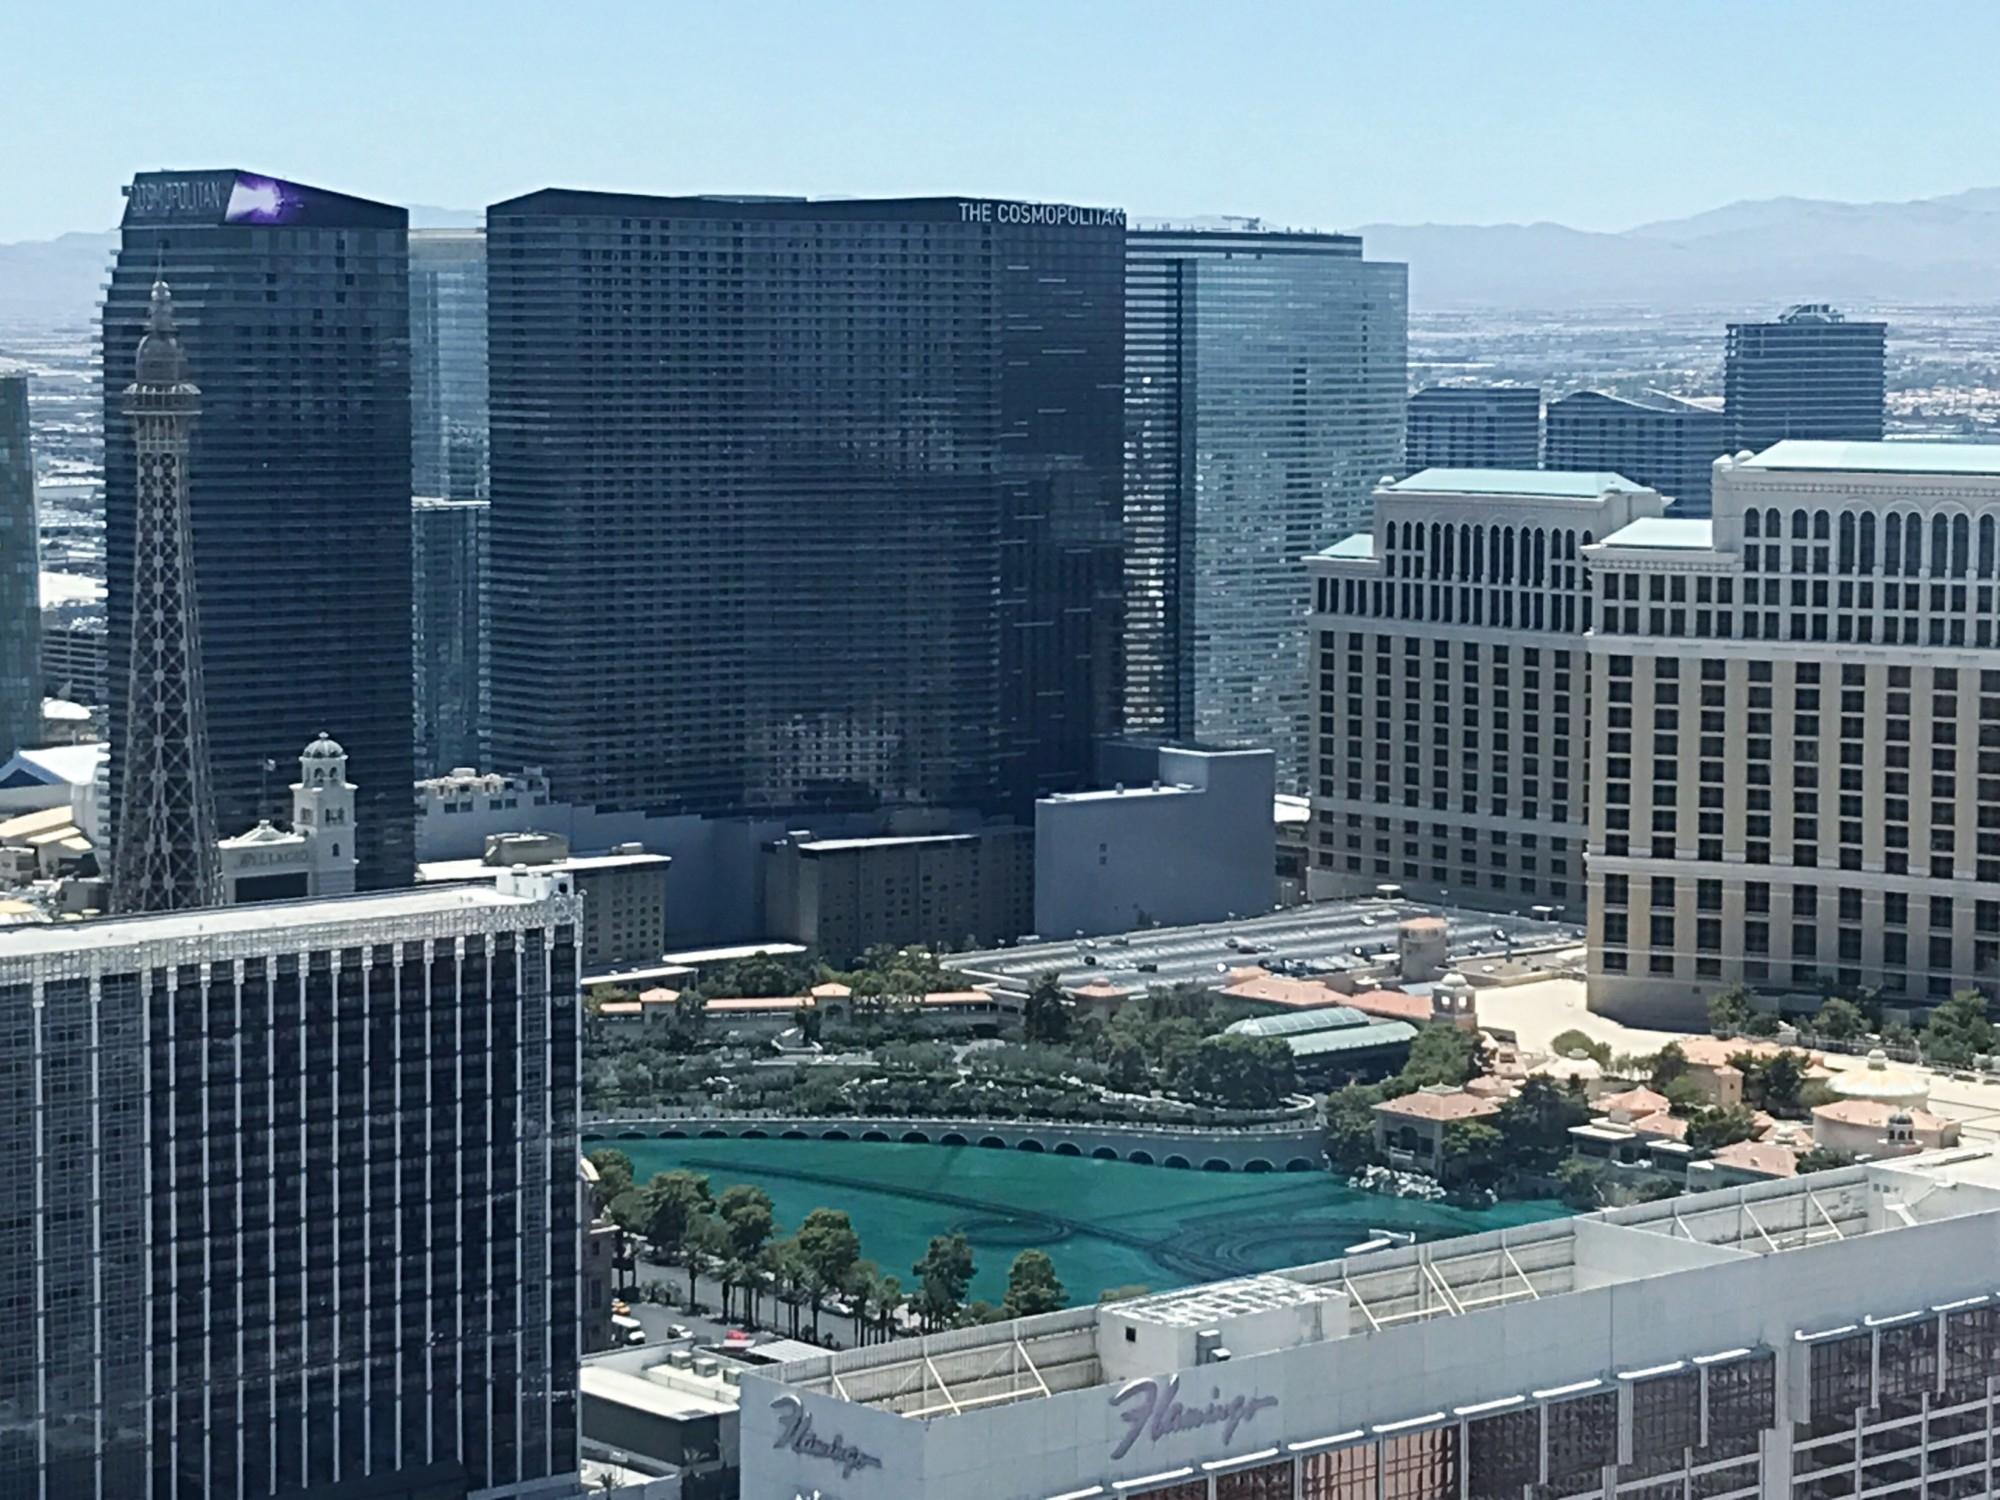 High Roller Observation Wheel in Las Vegas